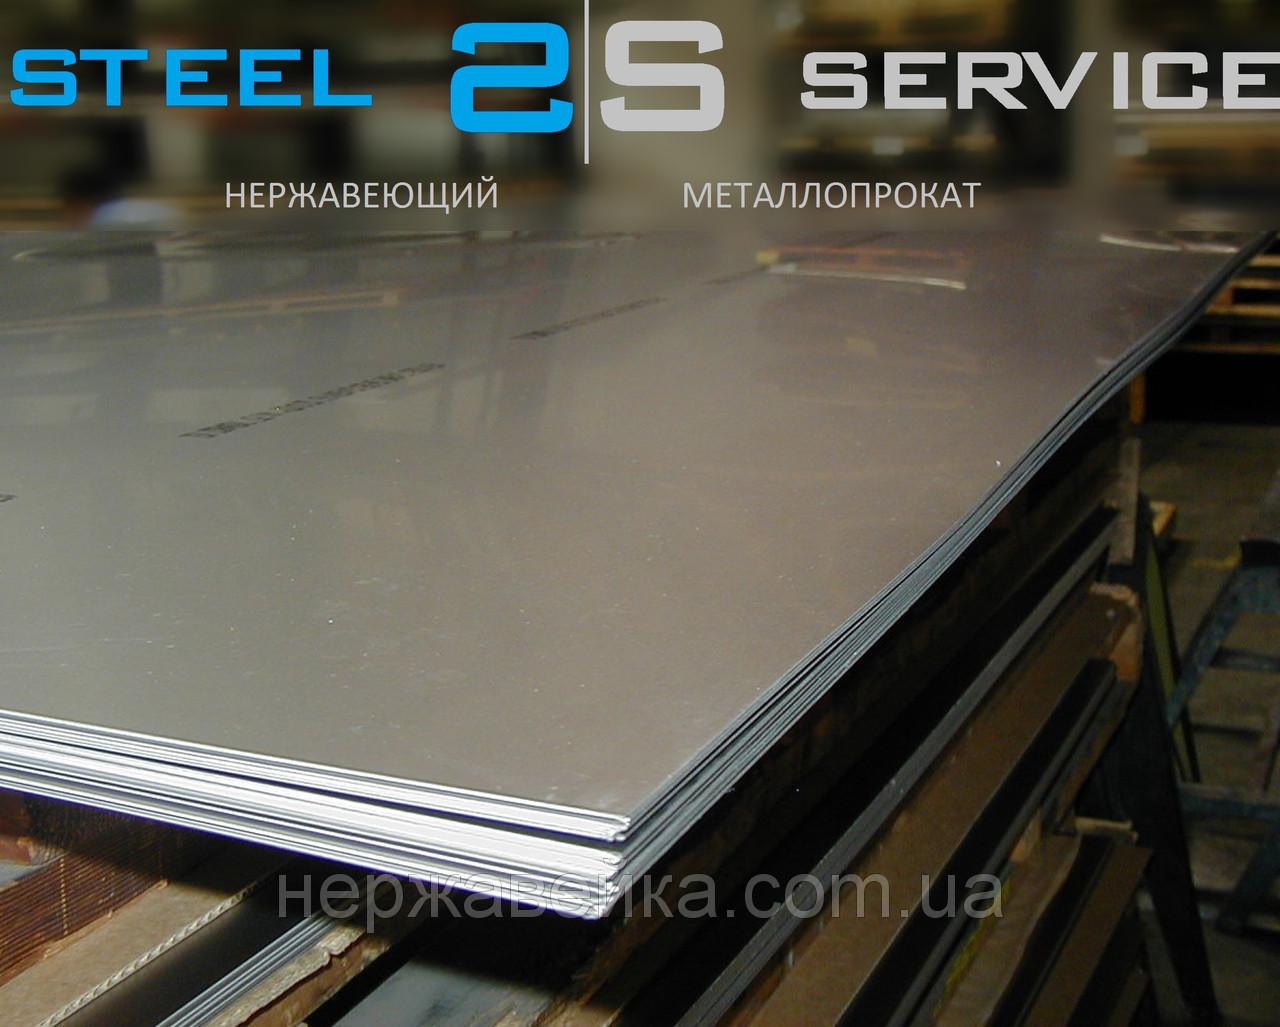 Нержавейка лист 3х1500х3000мм AISI 430(12Х17) BA - зеркало, технический